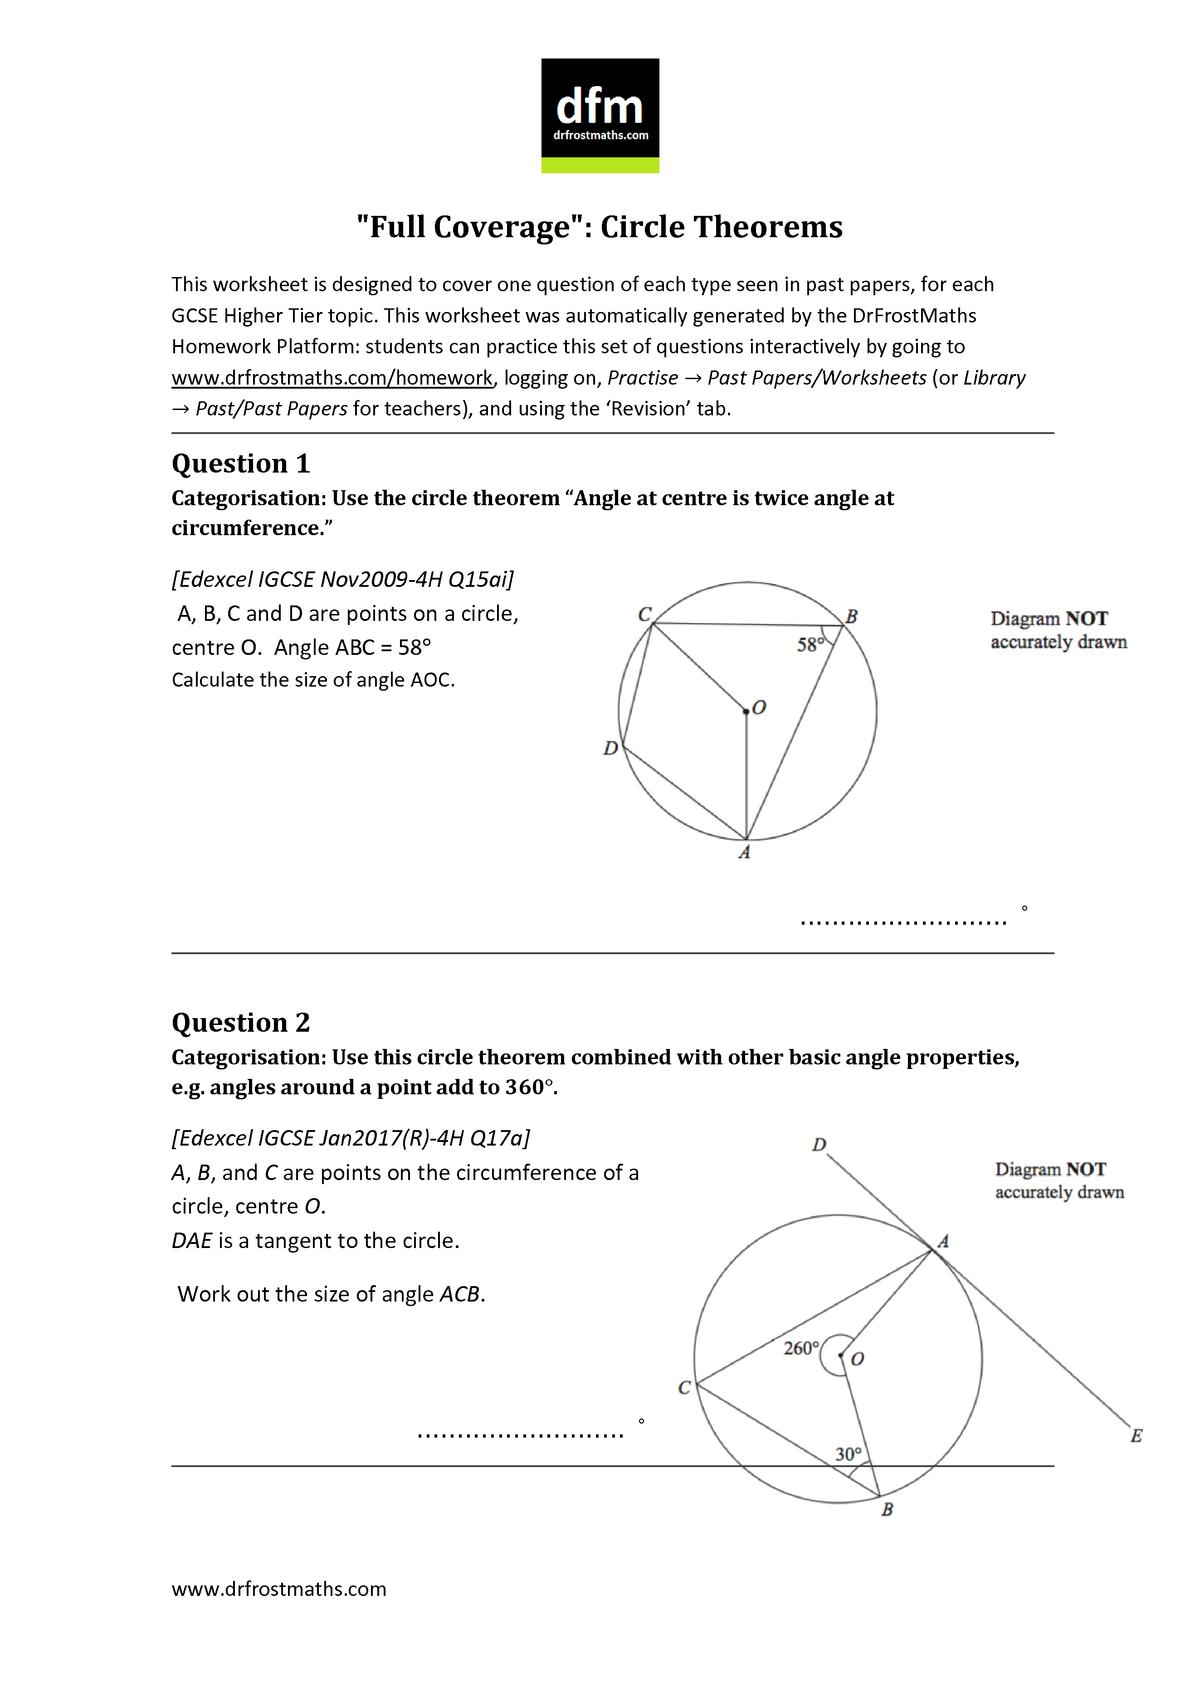 DFMFull Coverage-Circle Theorems - MBIO213 - Plymouth - StuDocu